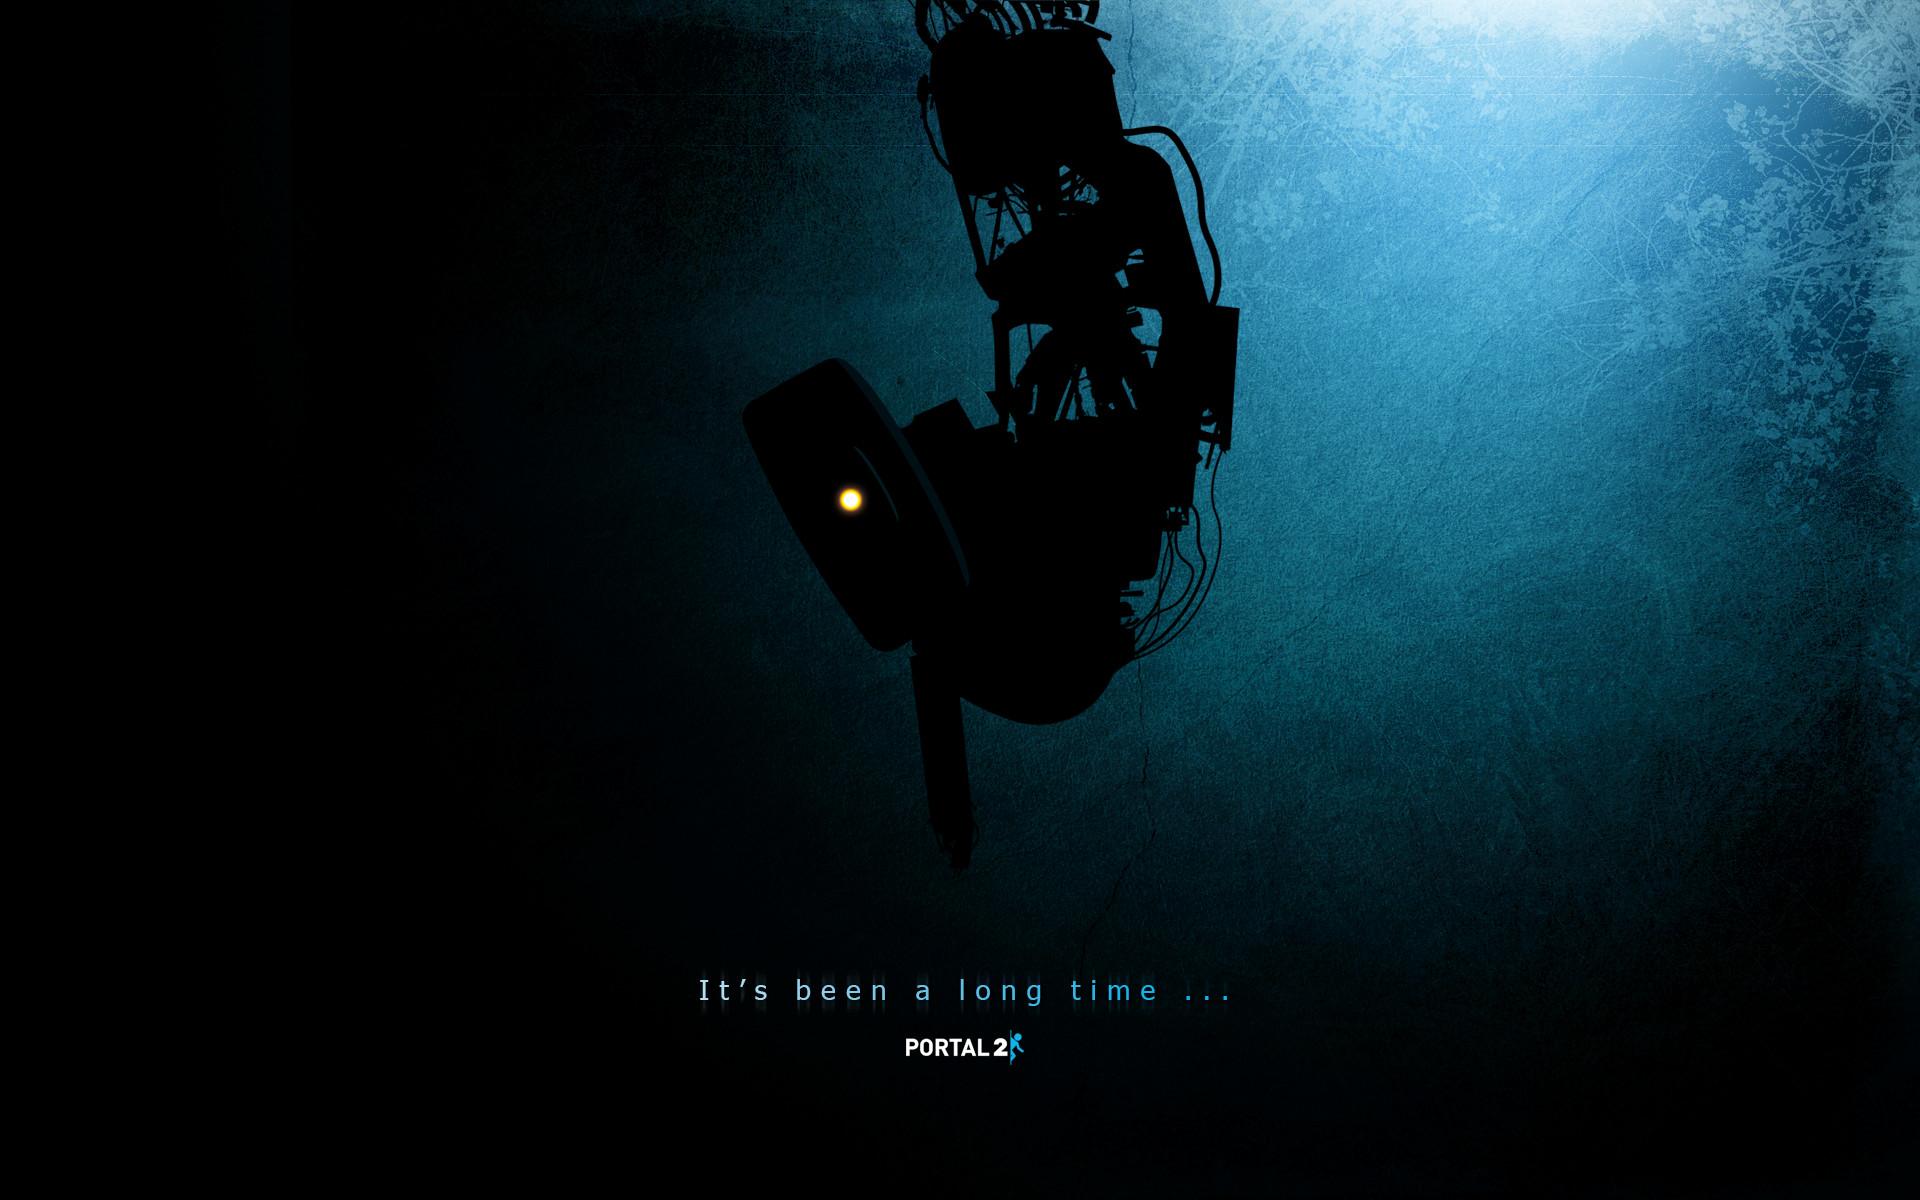 Portal 2 Background